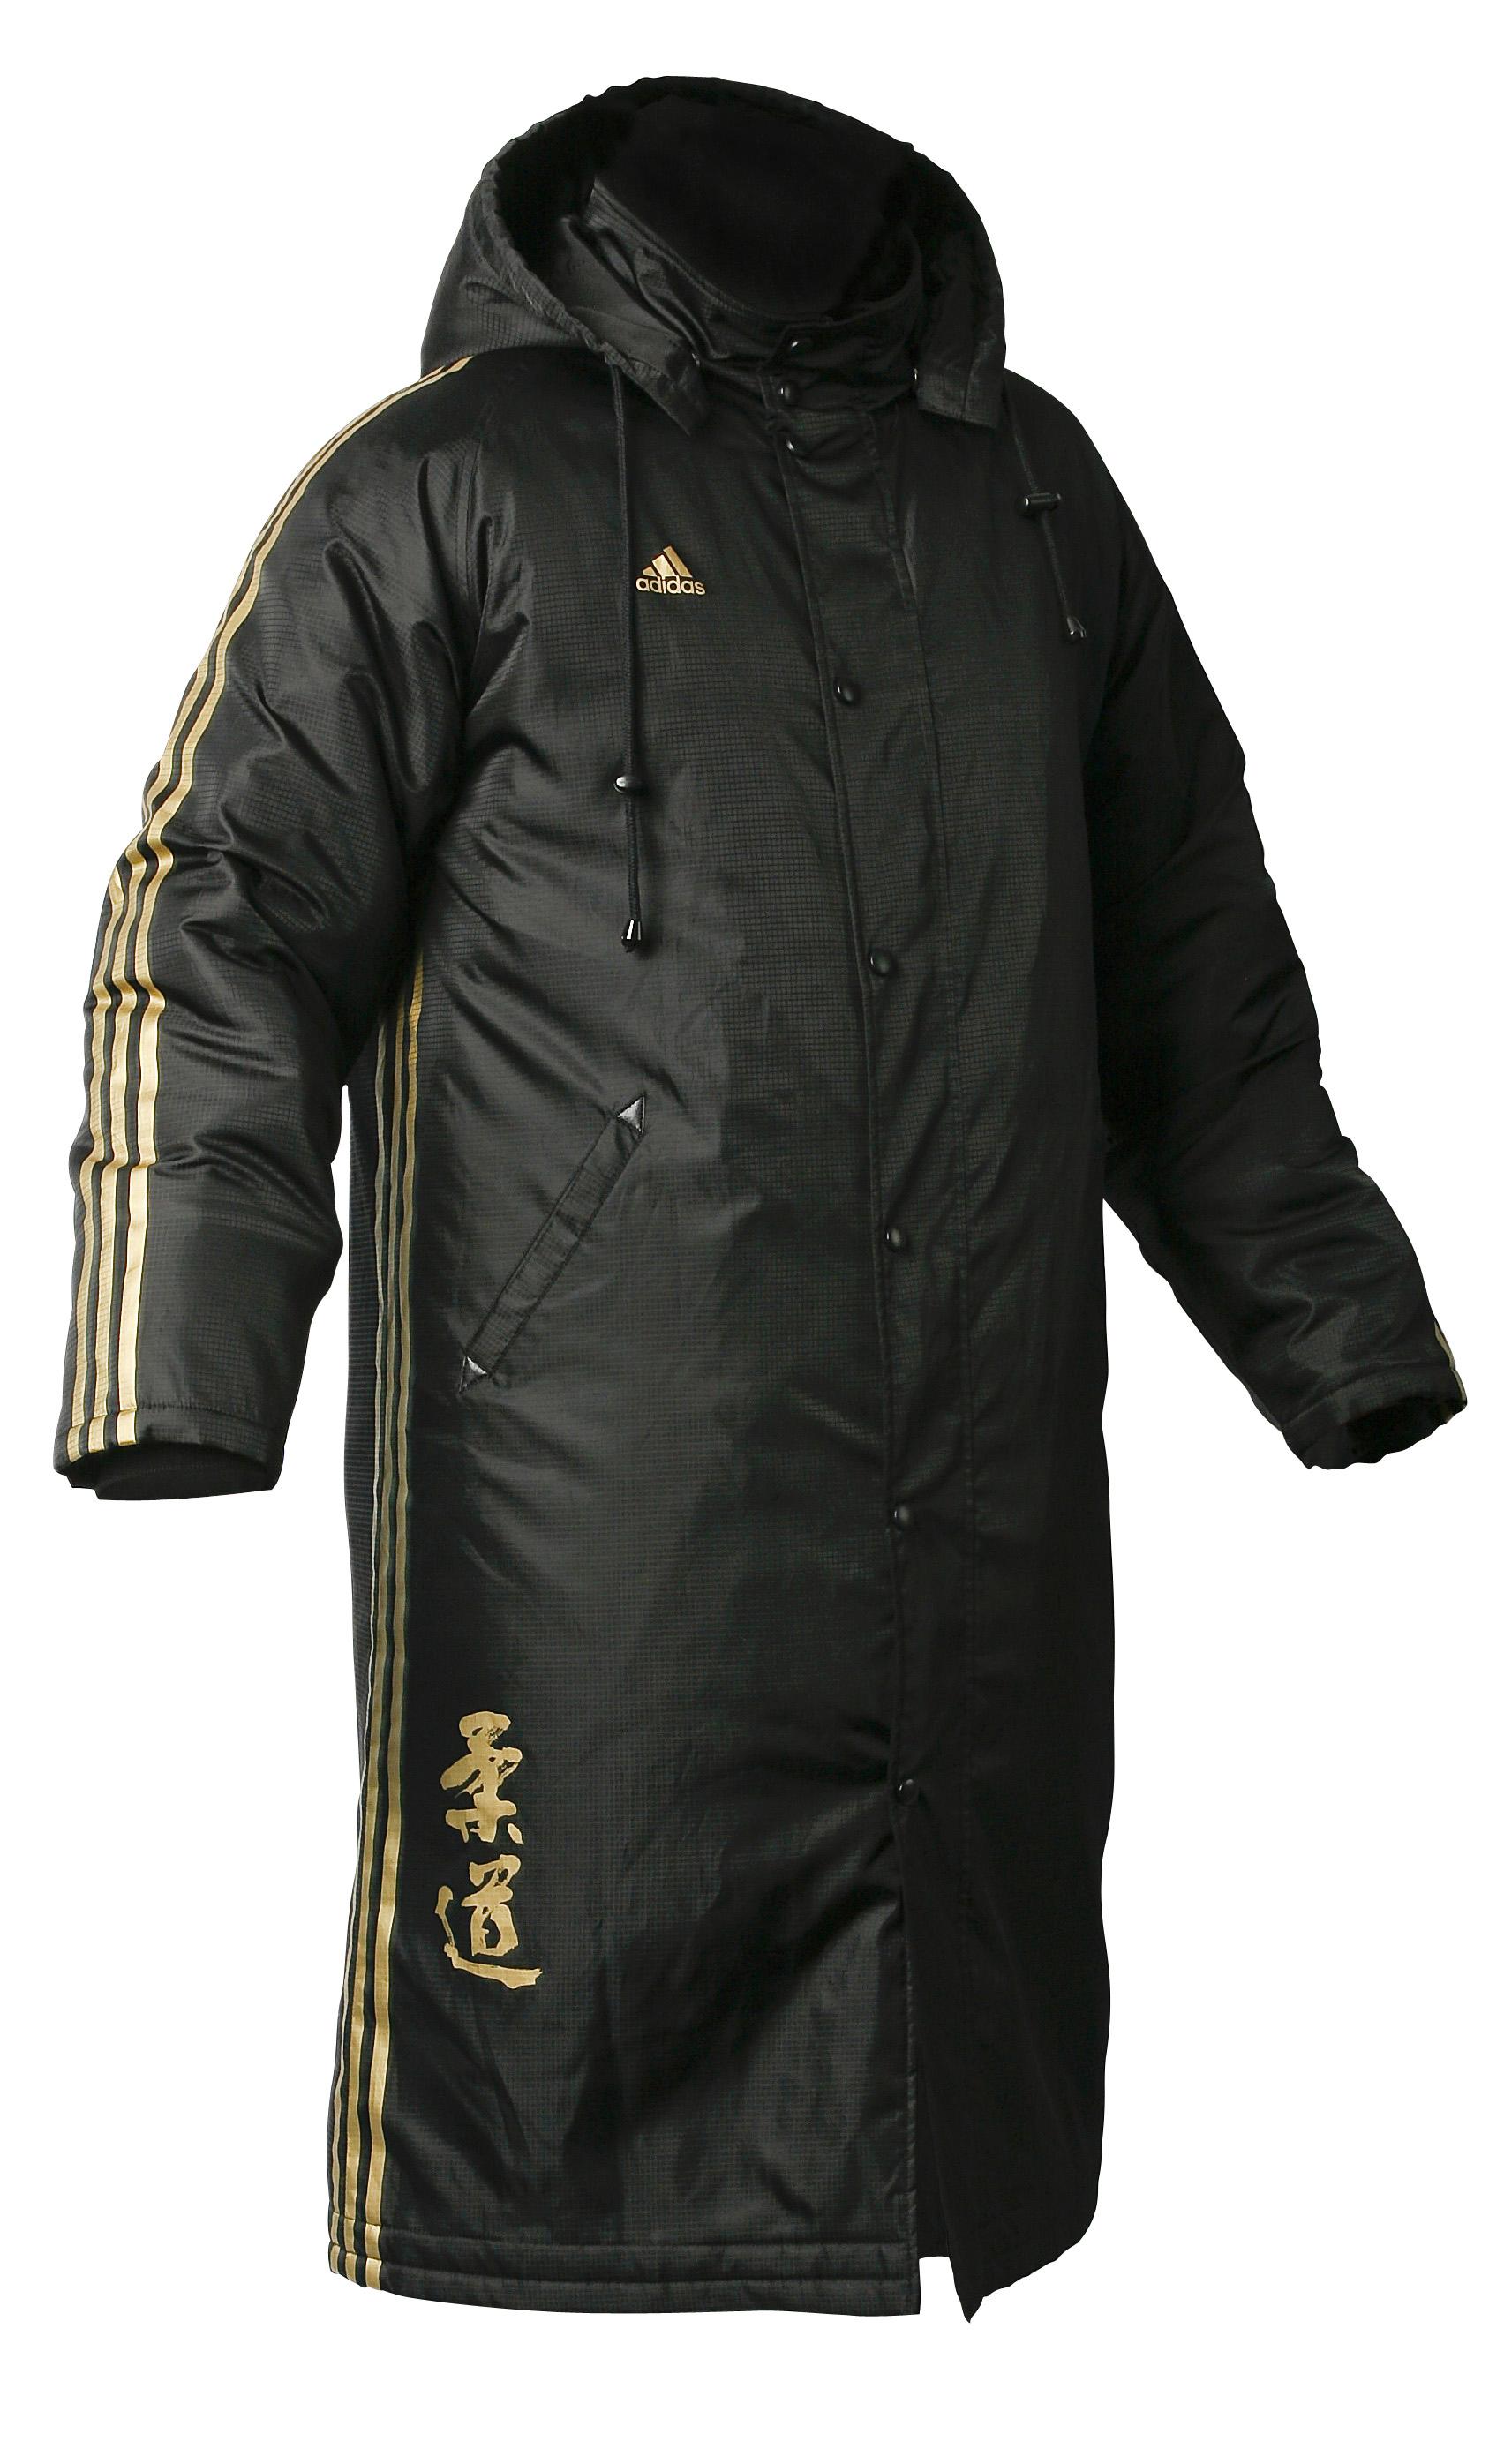 6df9b532e555 Adidas Mens Long Budo Spirit Winter Parka Jacket - Black Puffer Coat ...